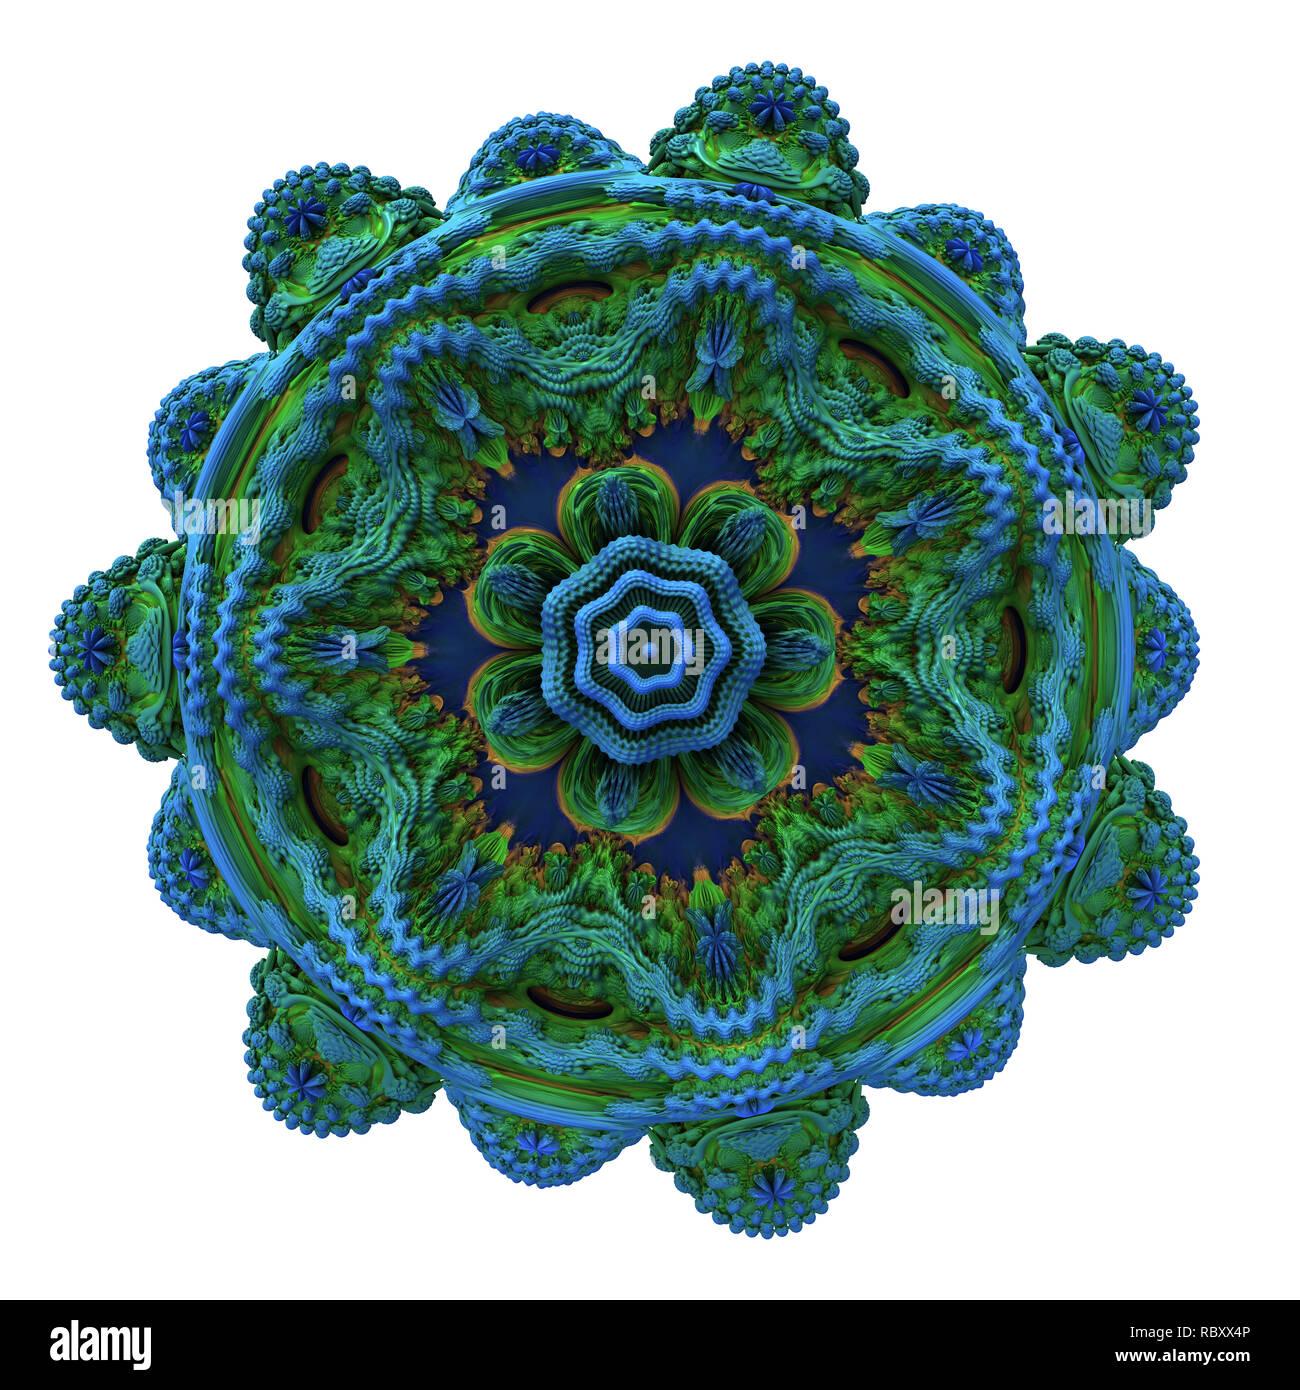 Abstract fractal digital art design 11138 - Stock Image